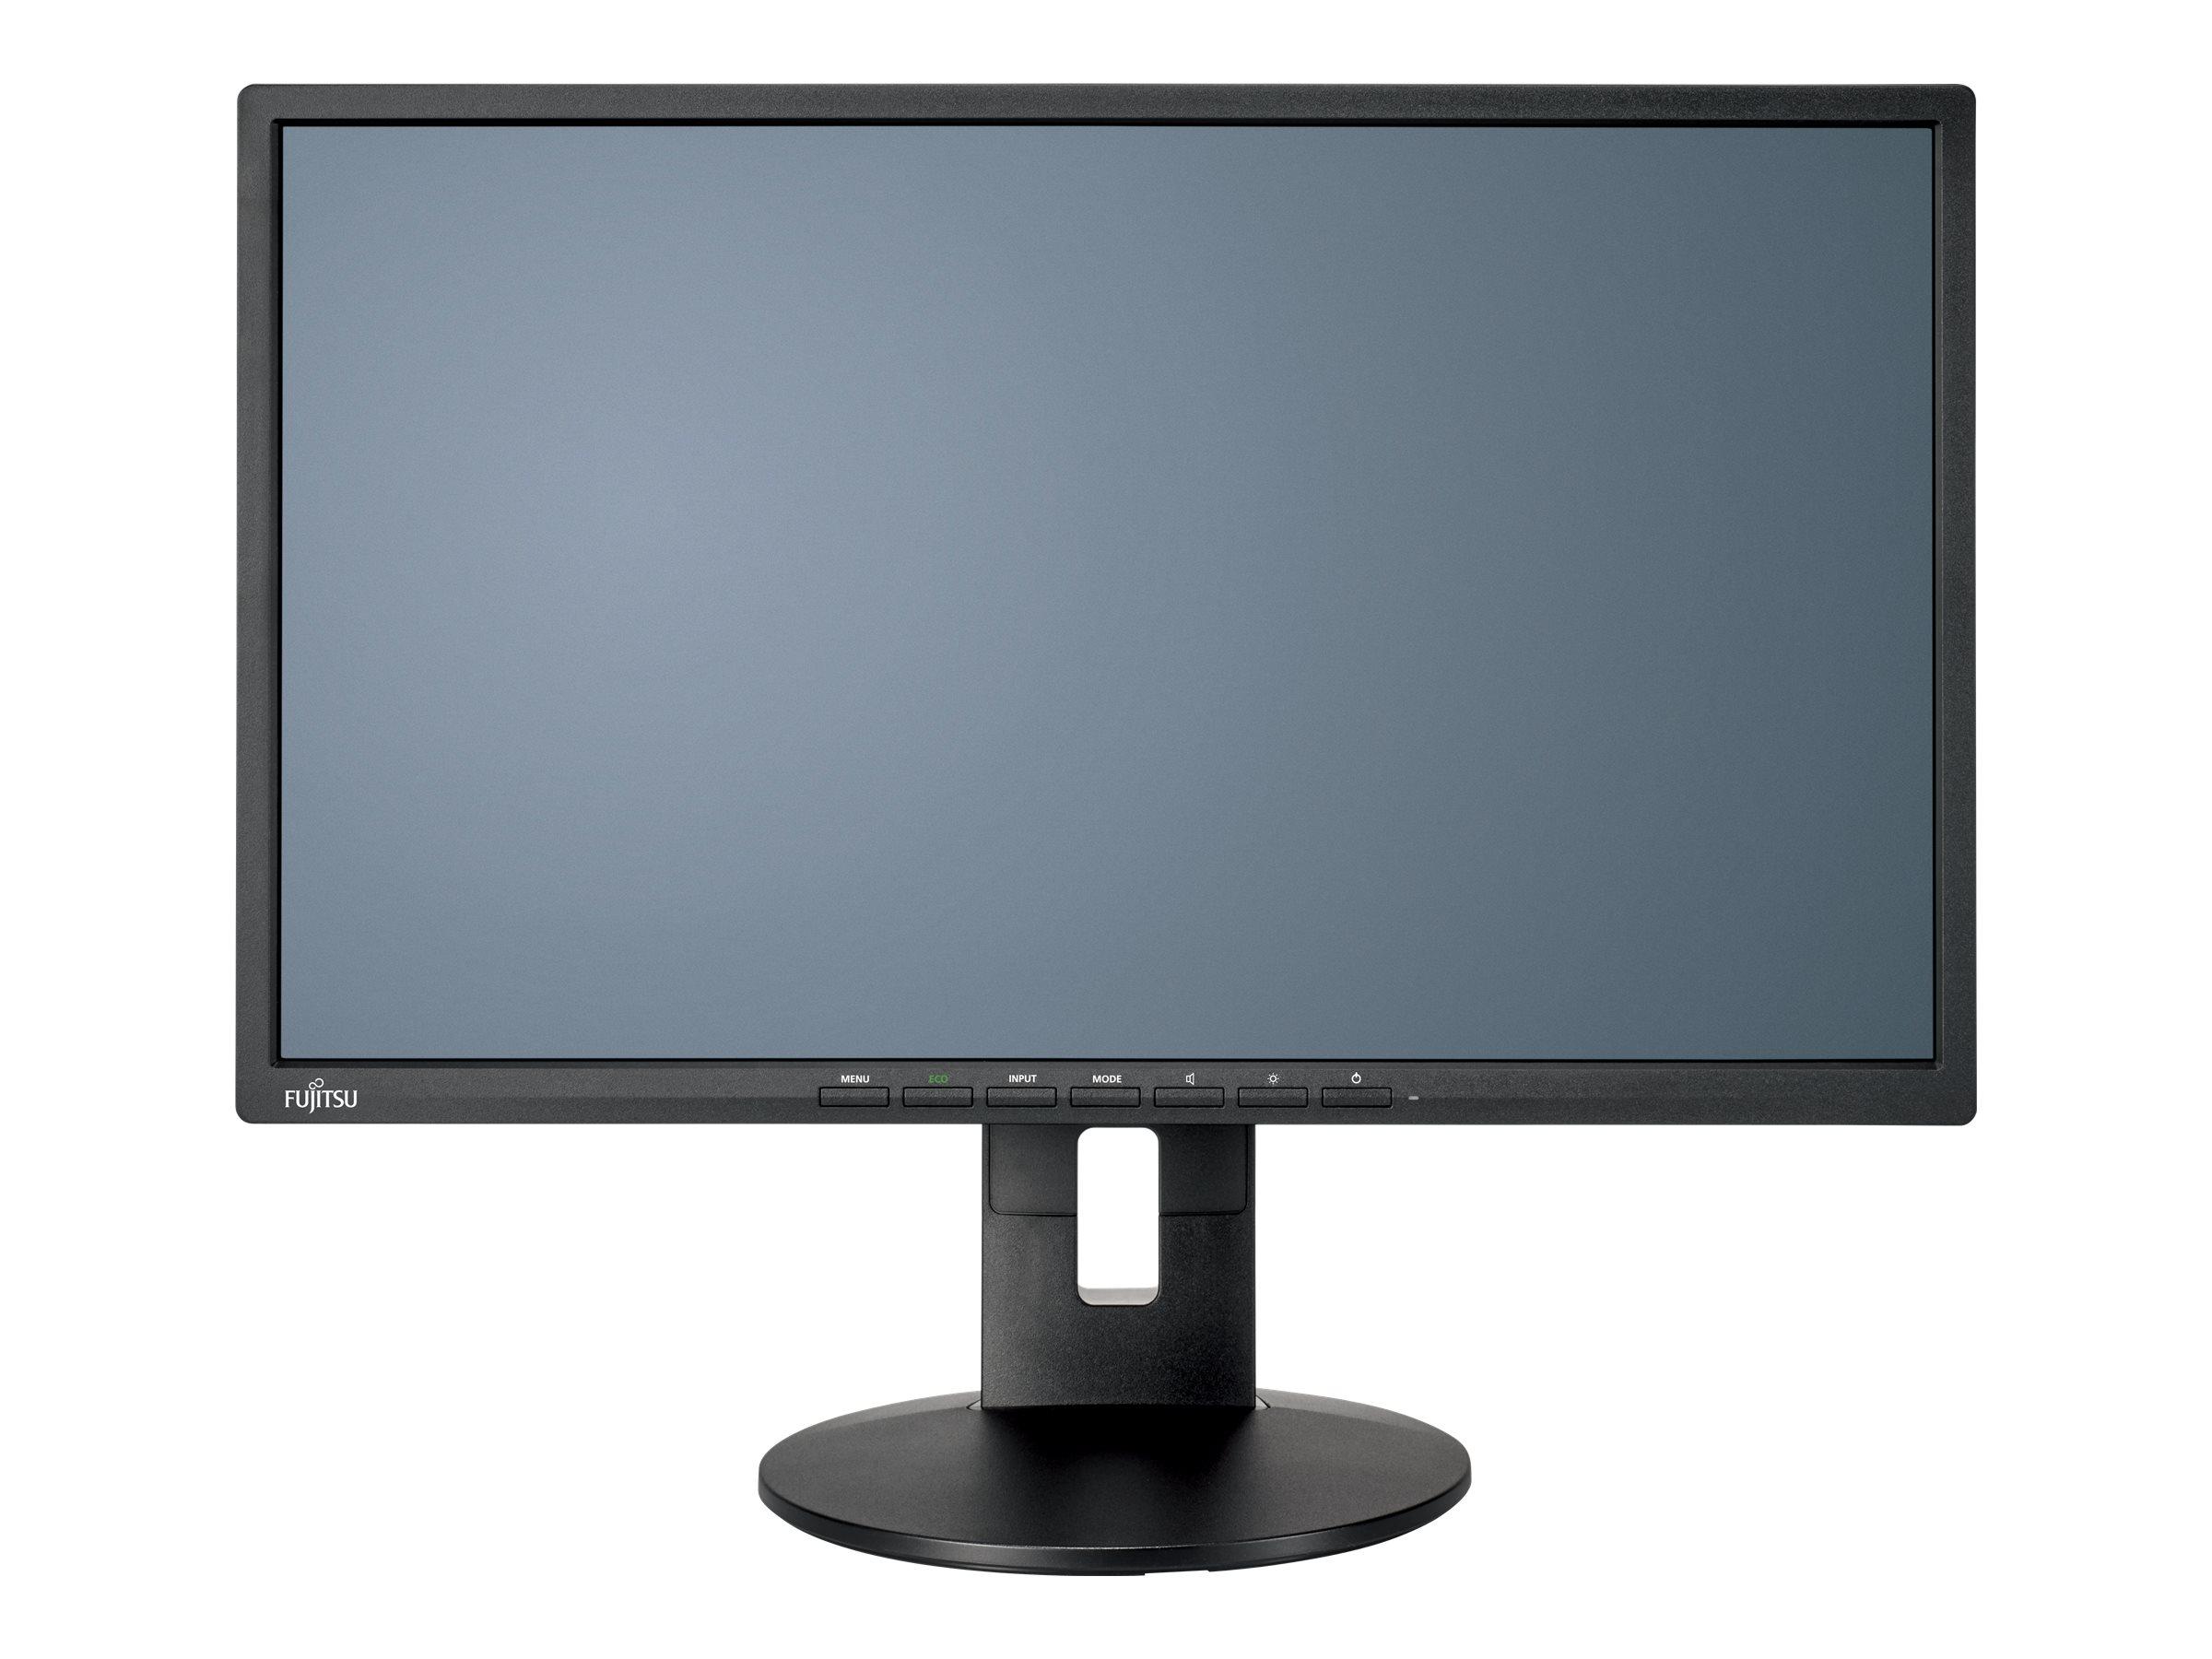 Fujitsu B22-8 TS Pro - Business Line - LED-Monitor - 54.6 cm (21.5